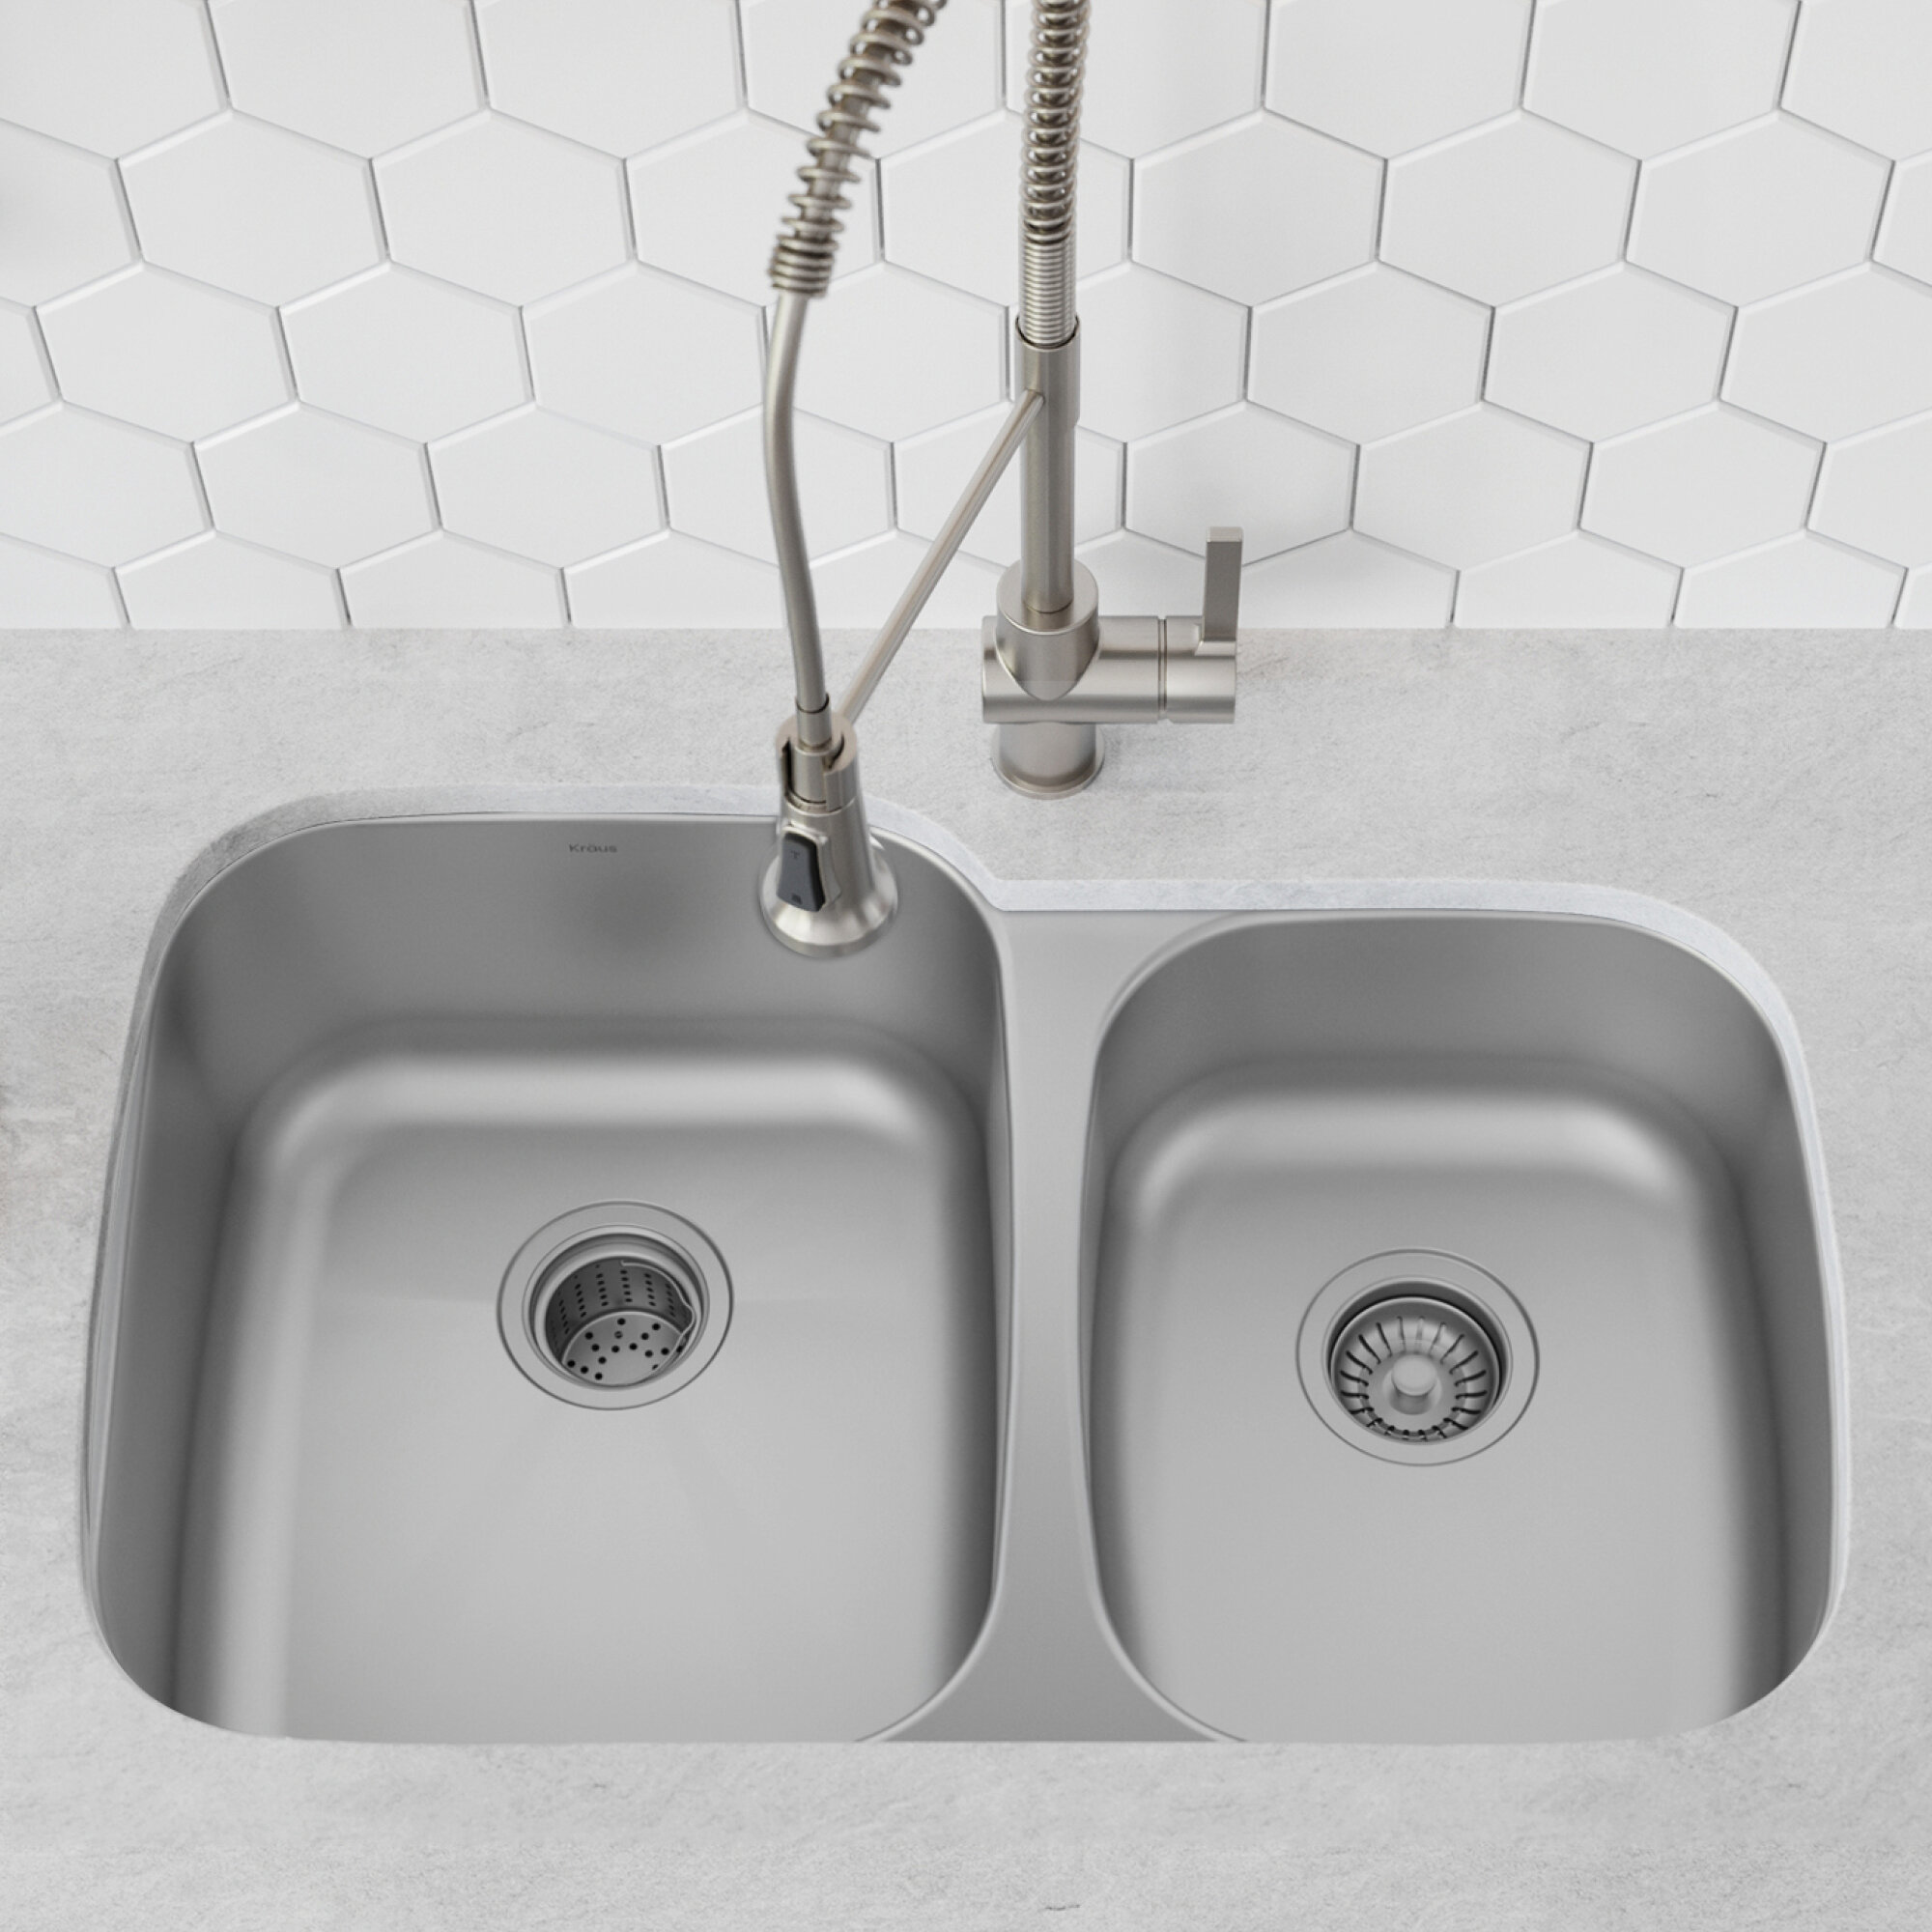 Kbu24 Kraus Premier 32 L X 21 W Double Basin Undermount Kitchen Sink With Basket Strainer And Drain Assembly Reviews Wayfair